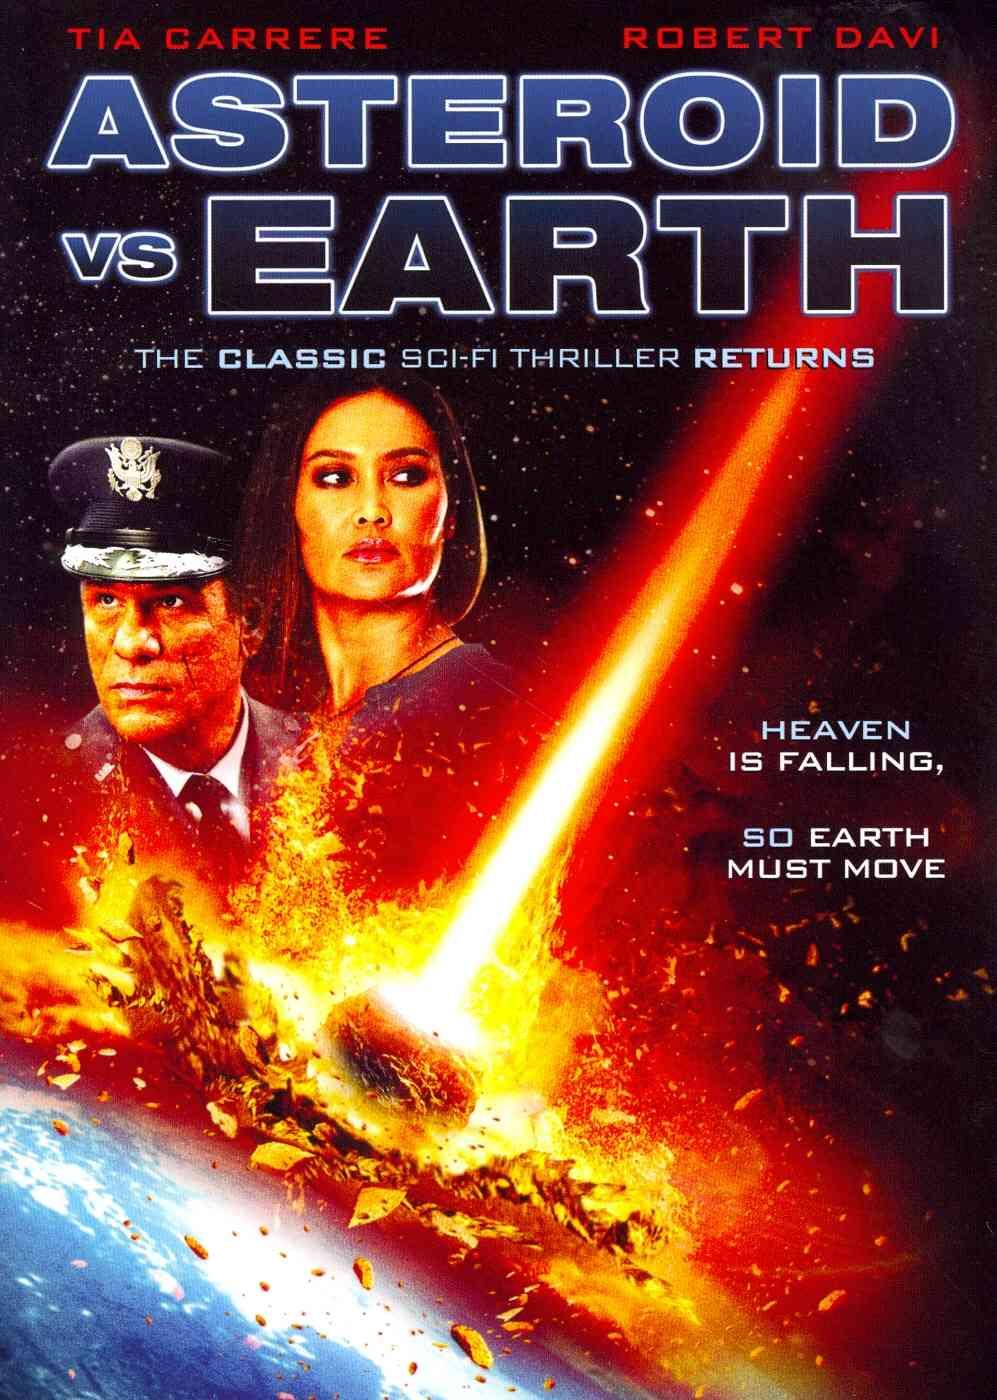 ASTEROID VS EARTH (DVD)